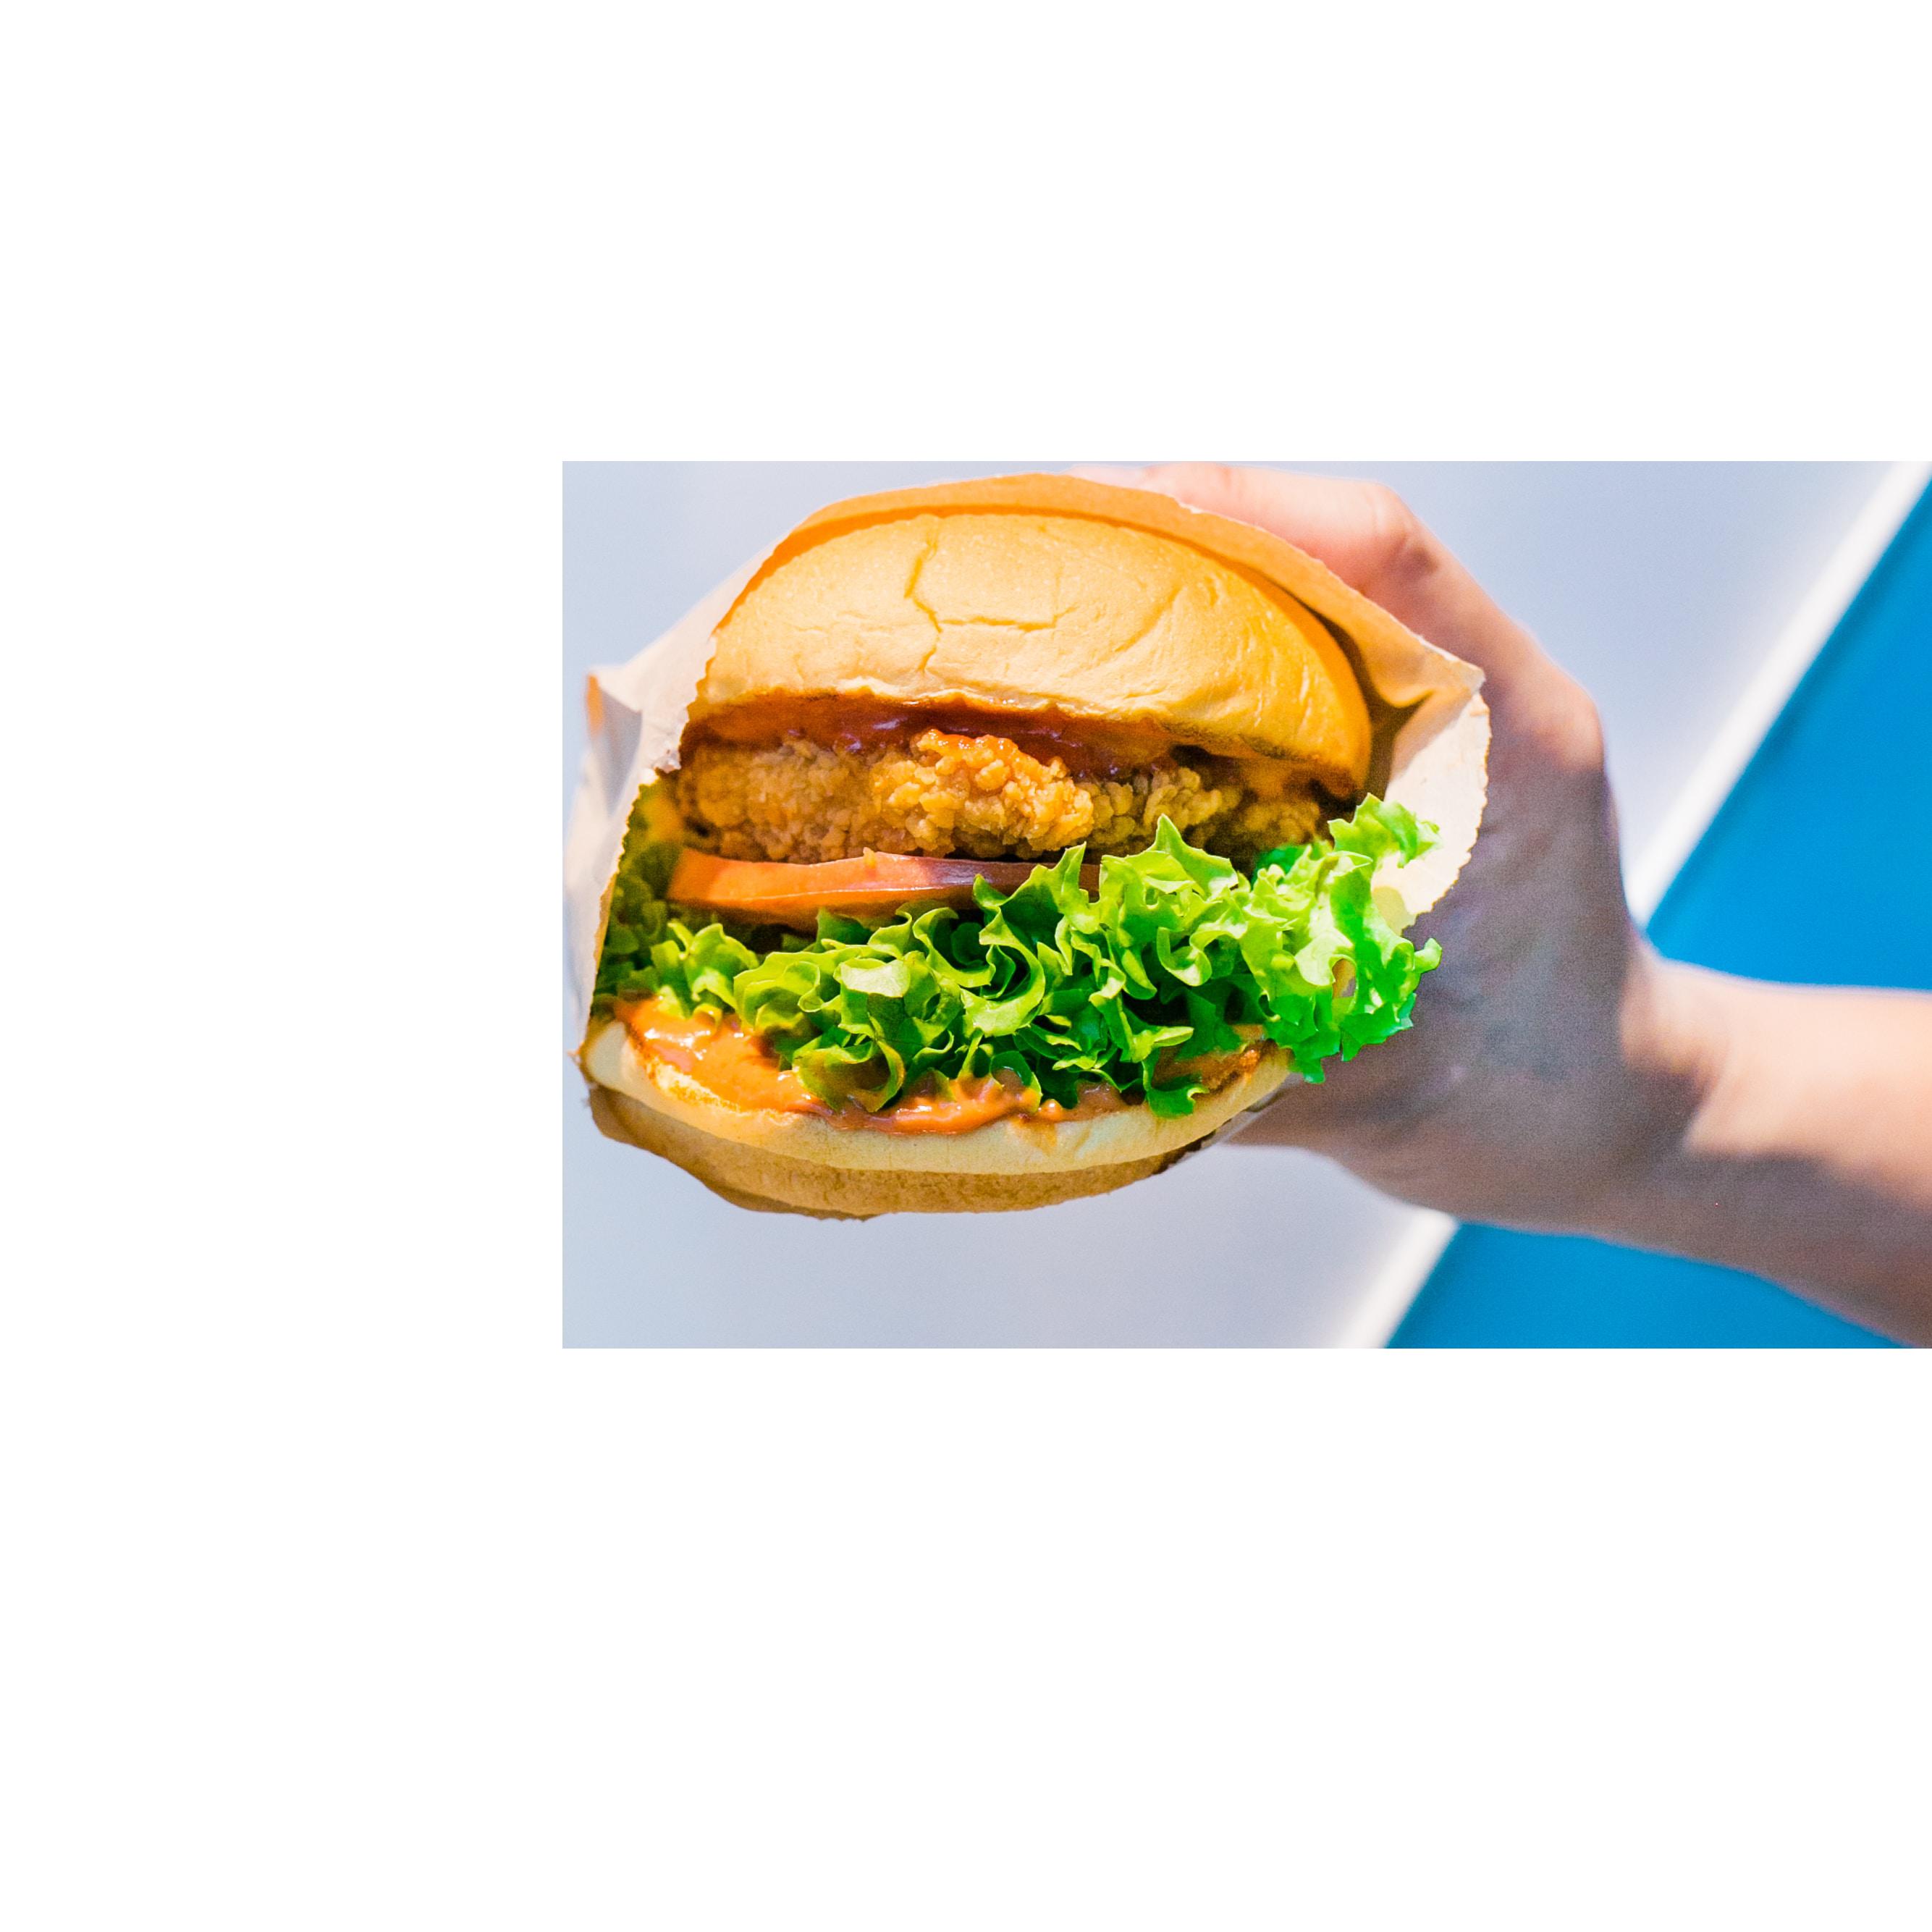 Burger in Hand Transparent Background PNG